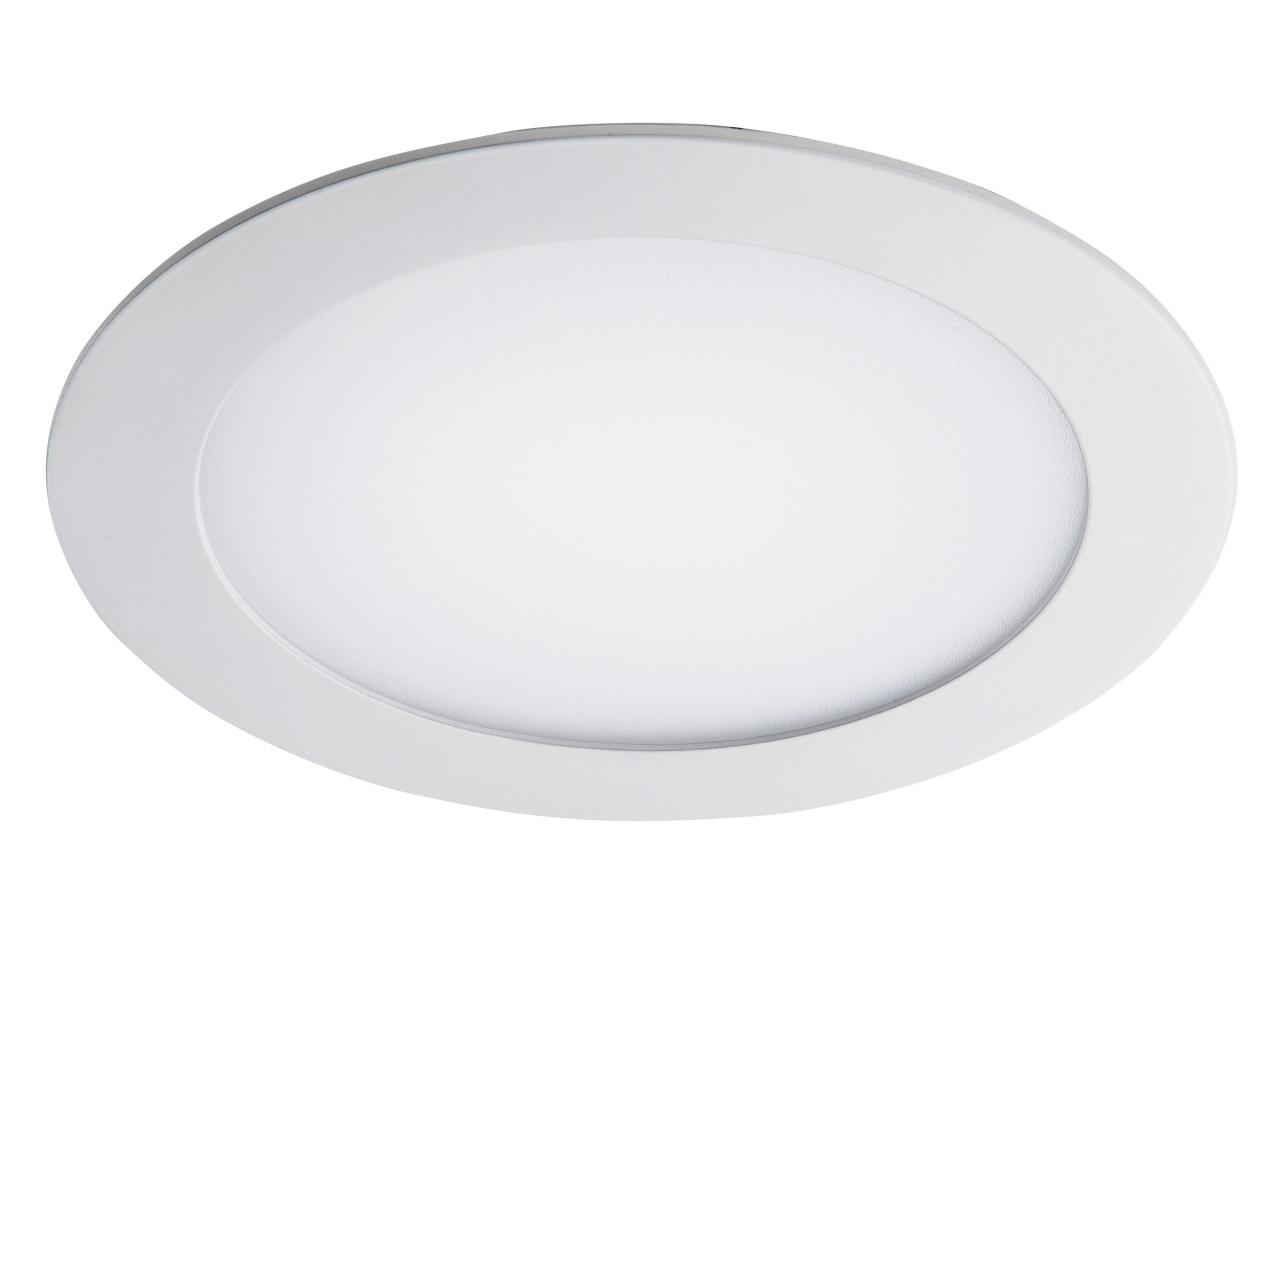 Светильник Zocco LED 12W 600LM 4000K Lightstar 223124